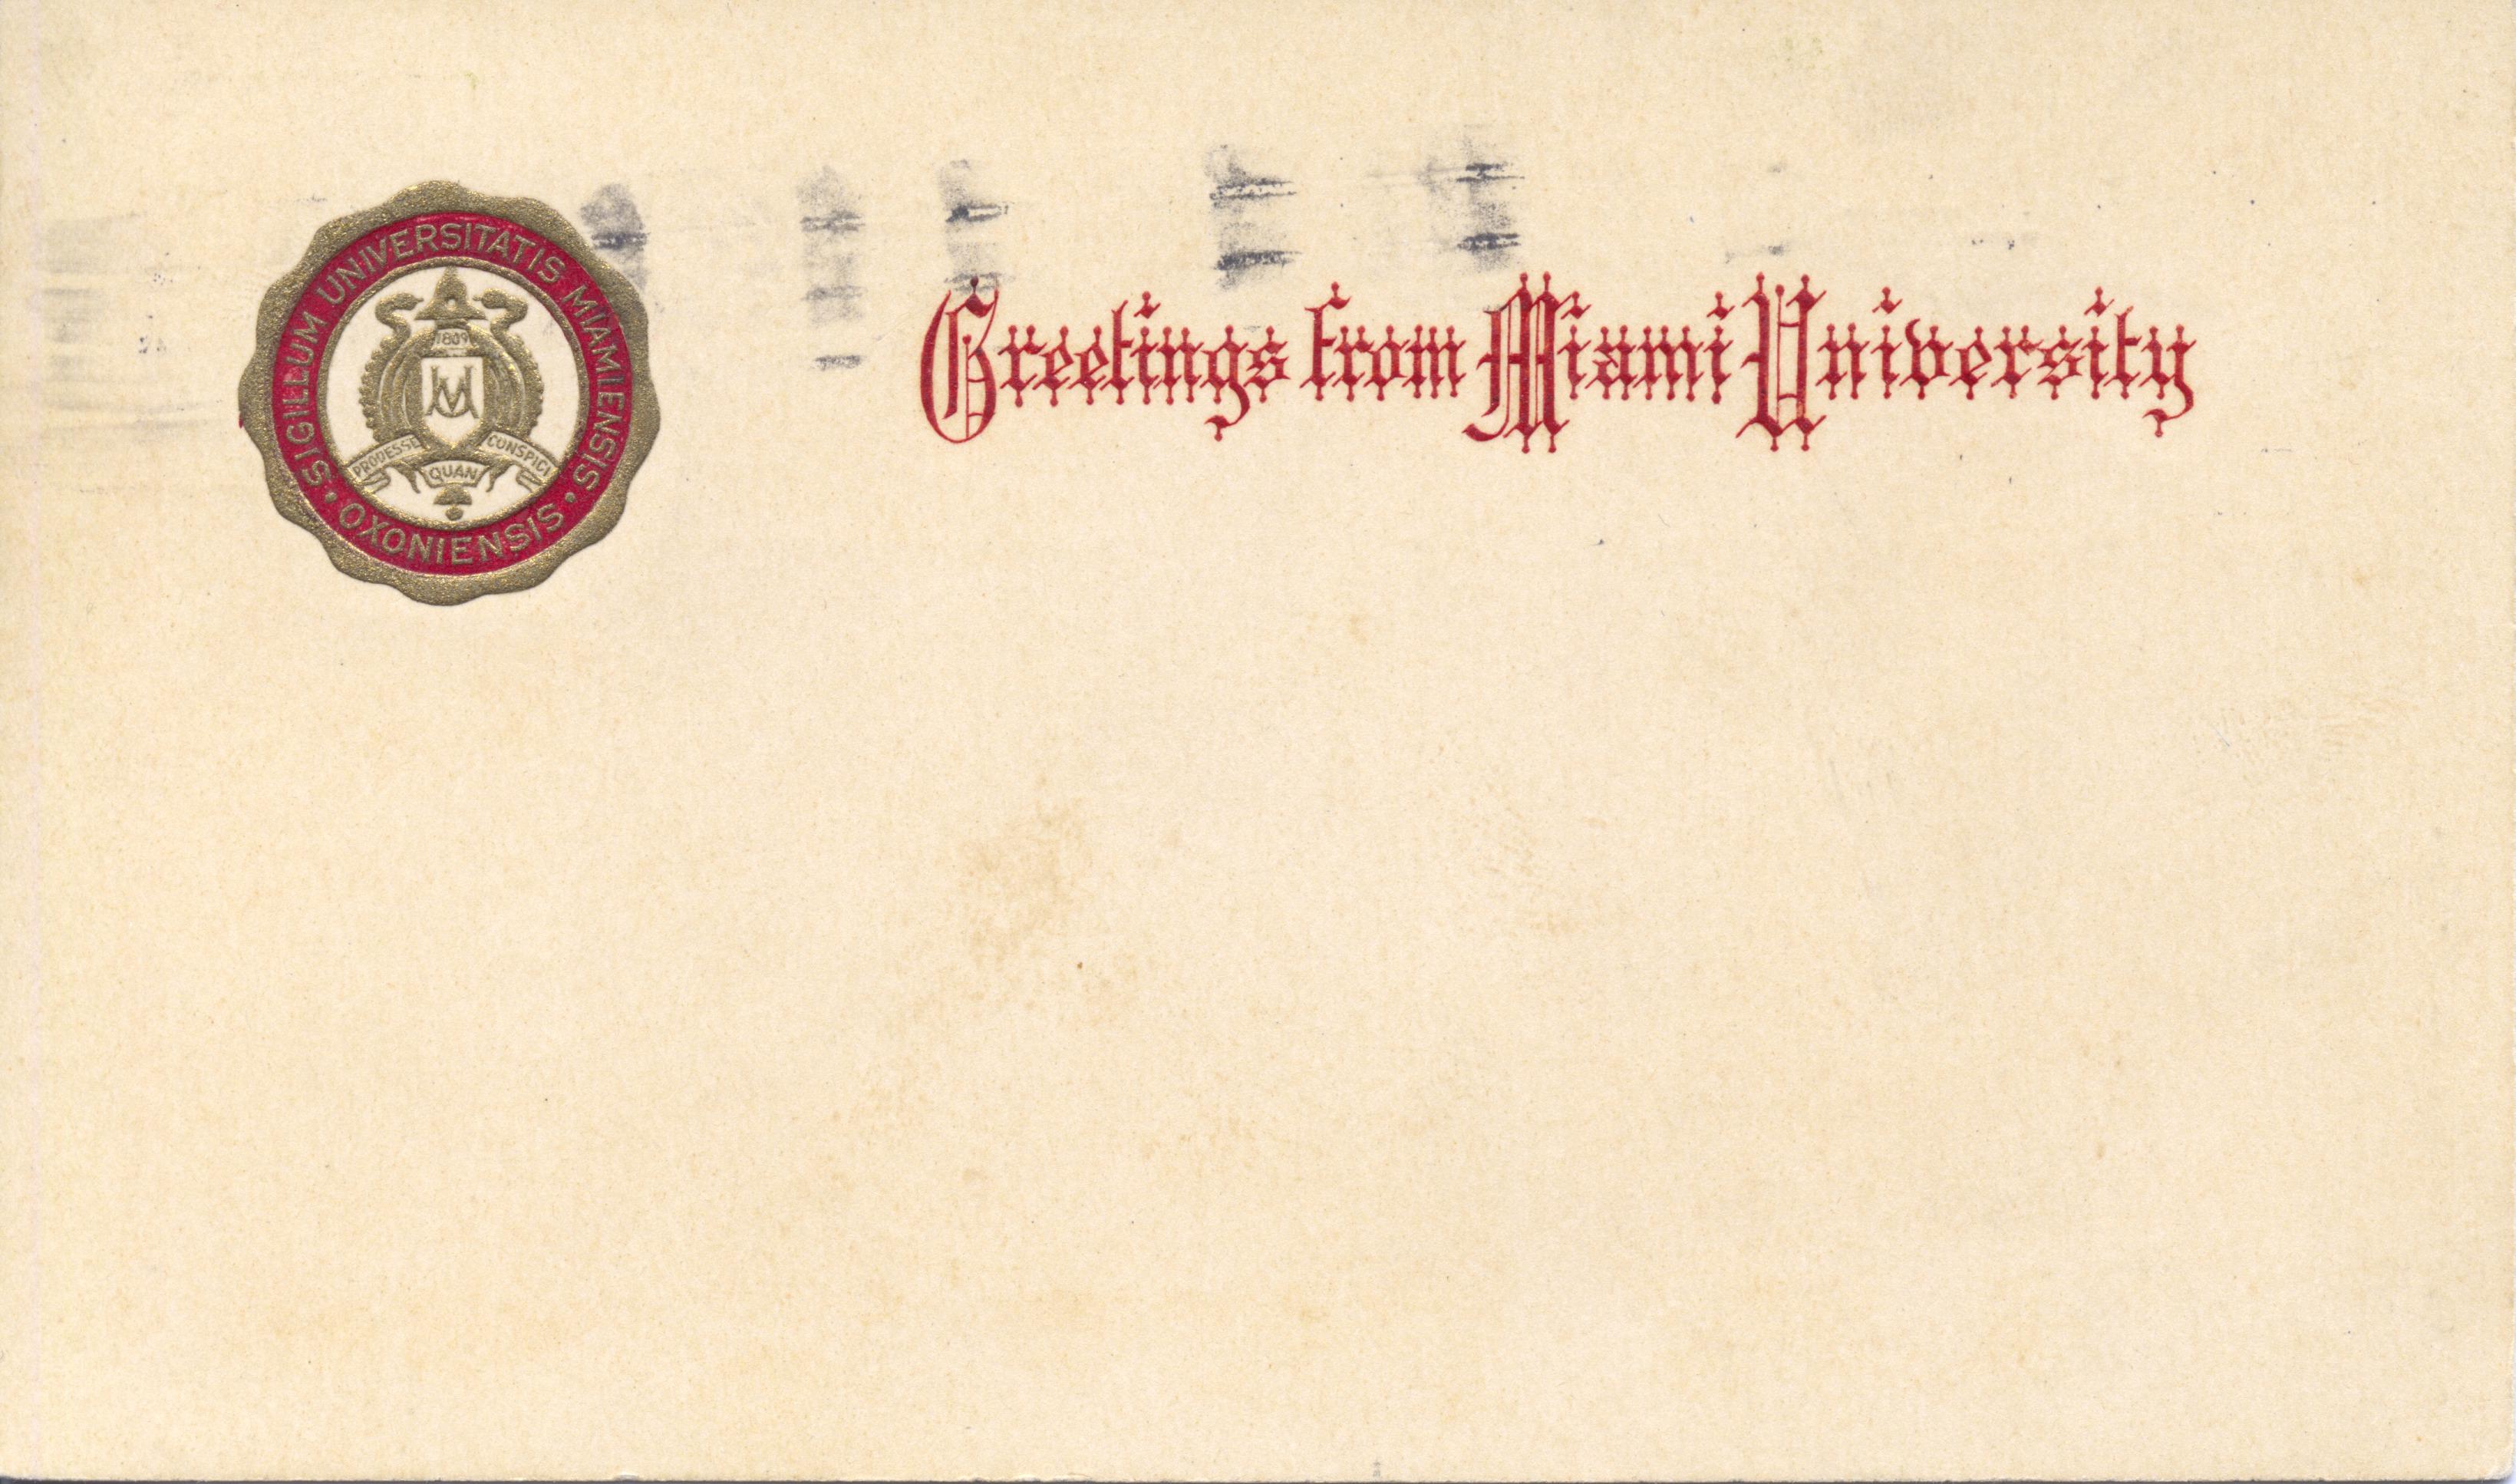 Filegreetings From Miami University 14143193691g Wikimedia